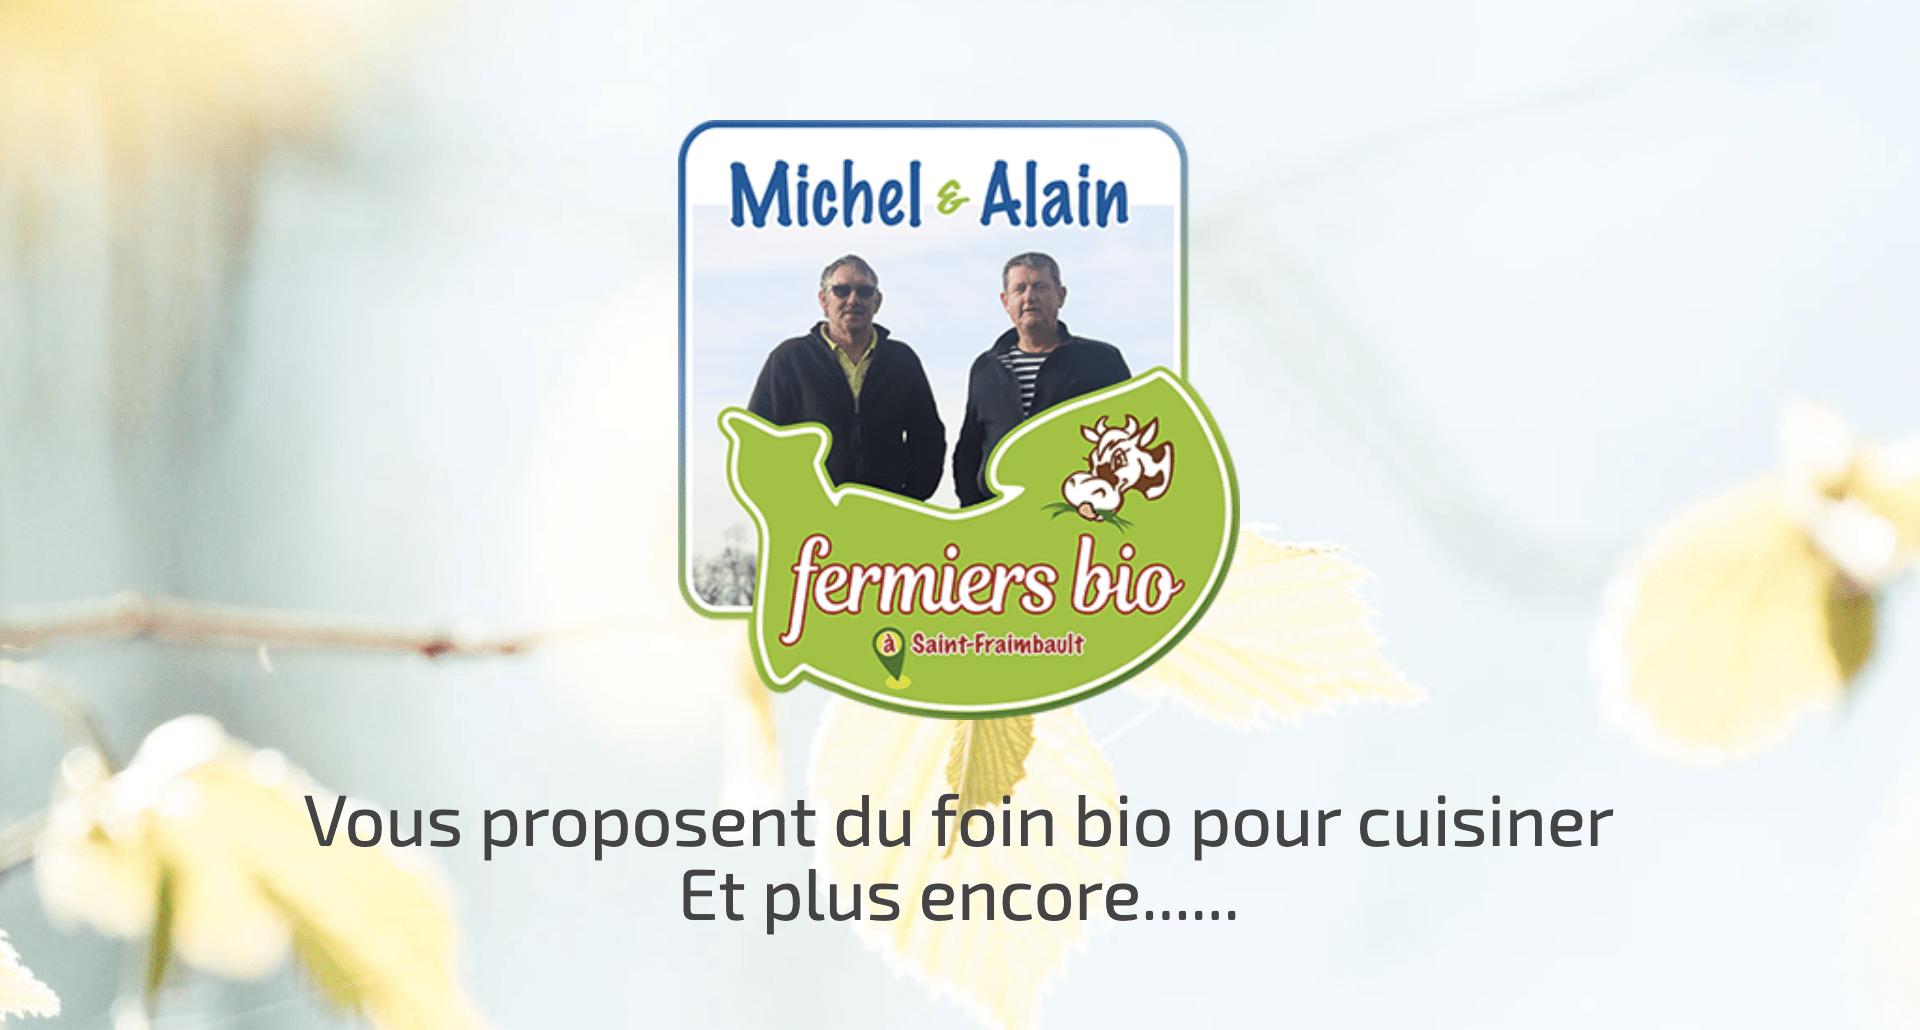 Michel & Alain